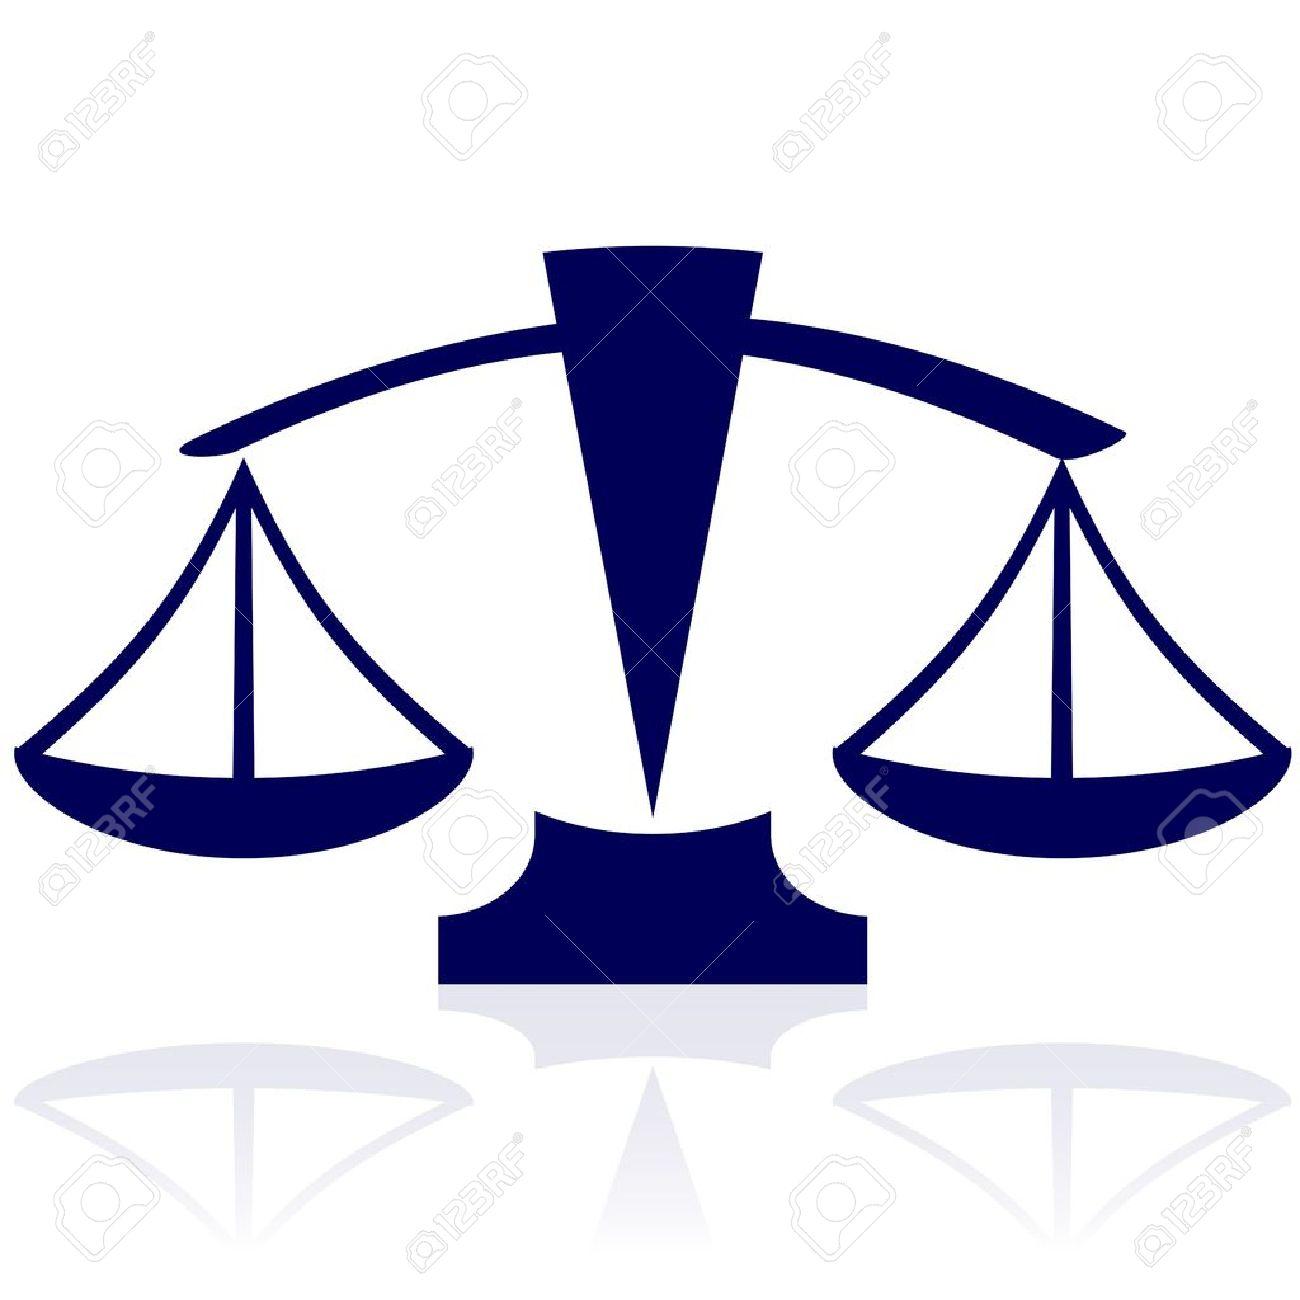 Justice scales - vector blue icon Stock Vector - 14181357